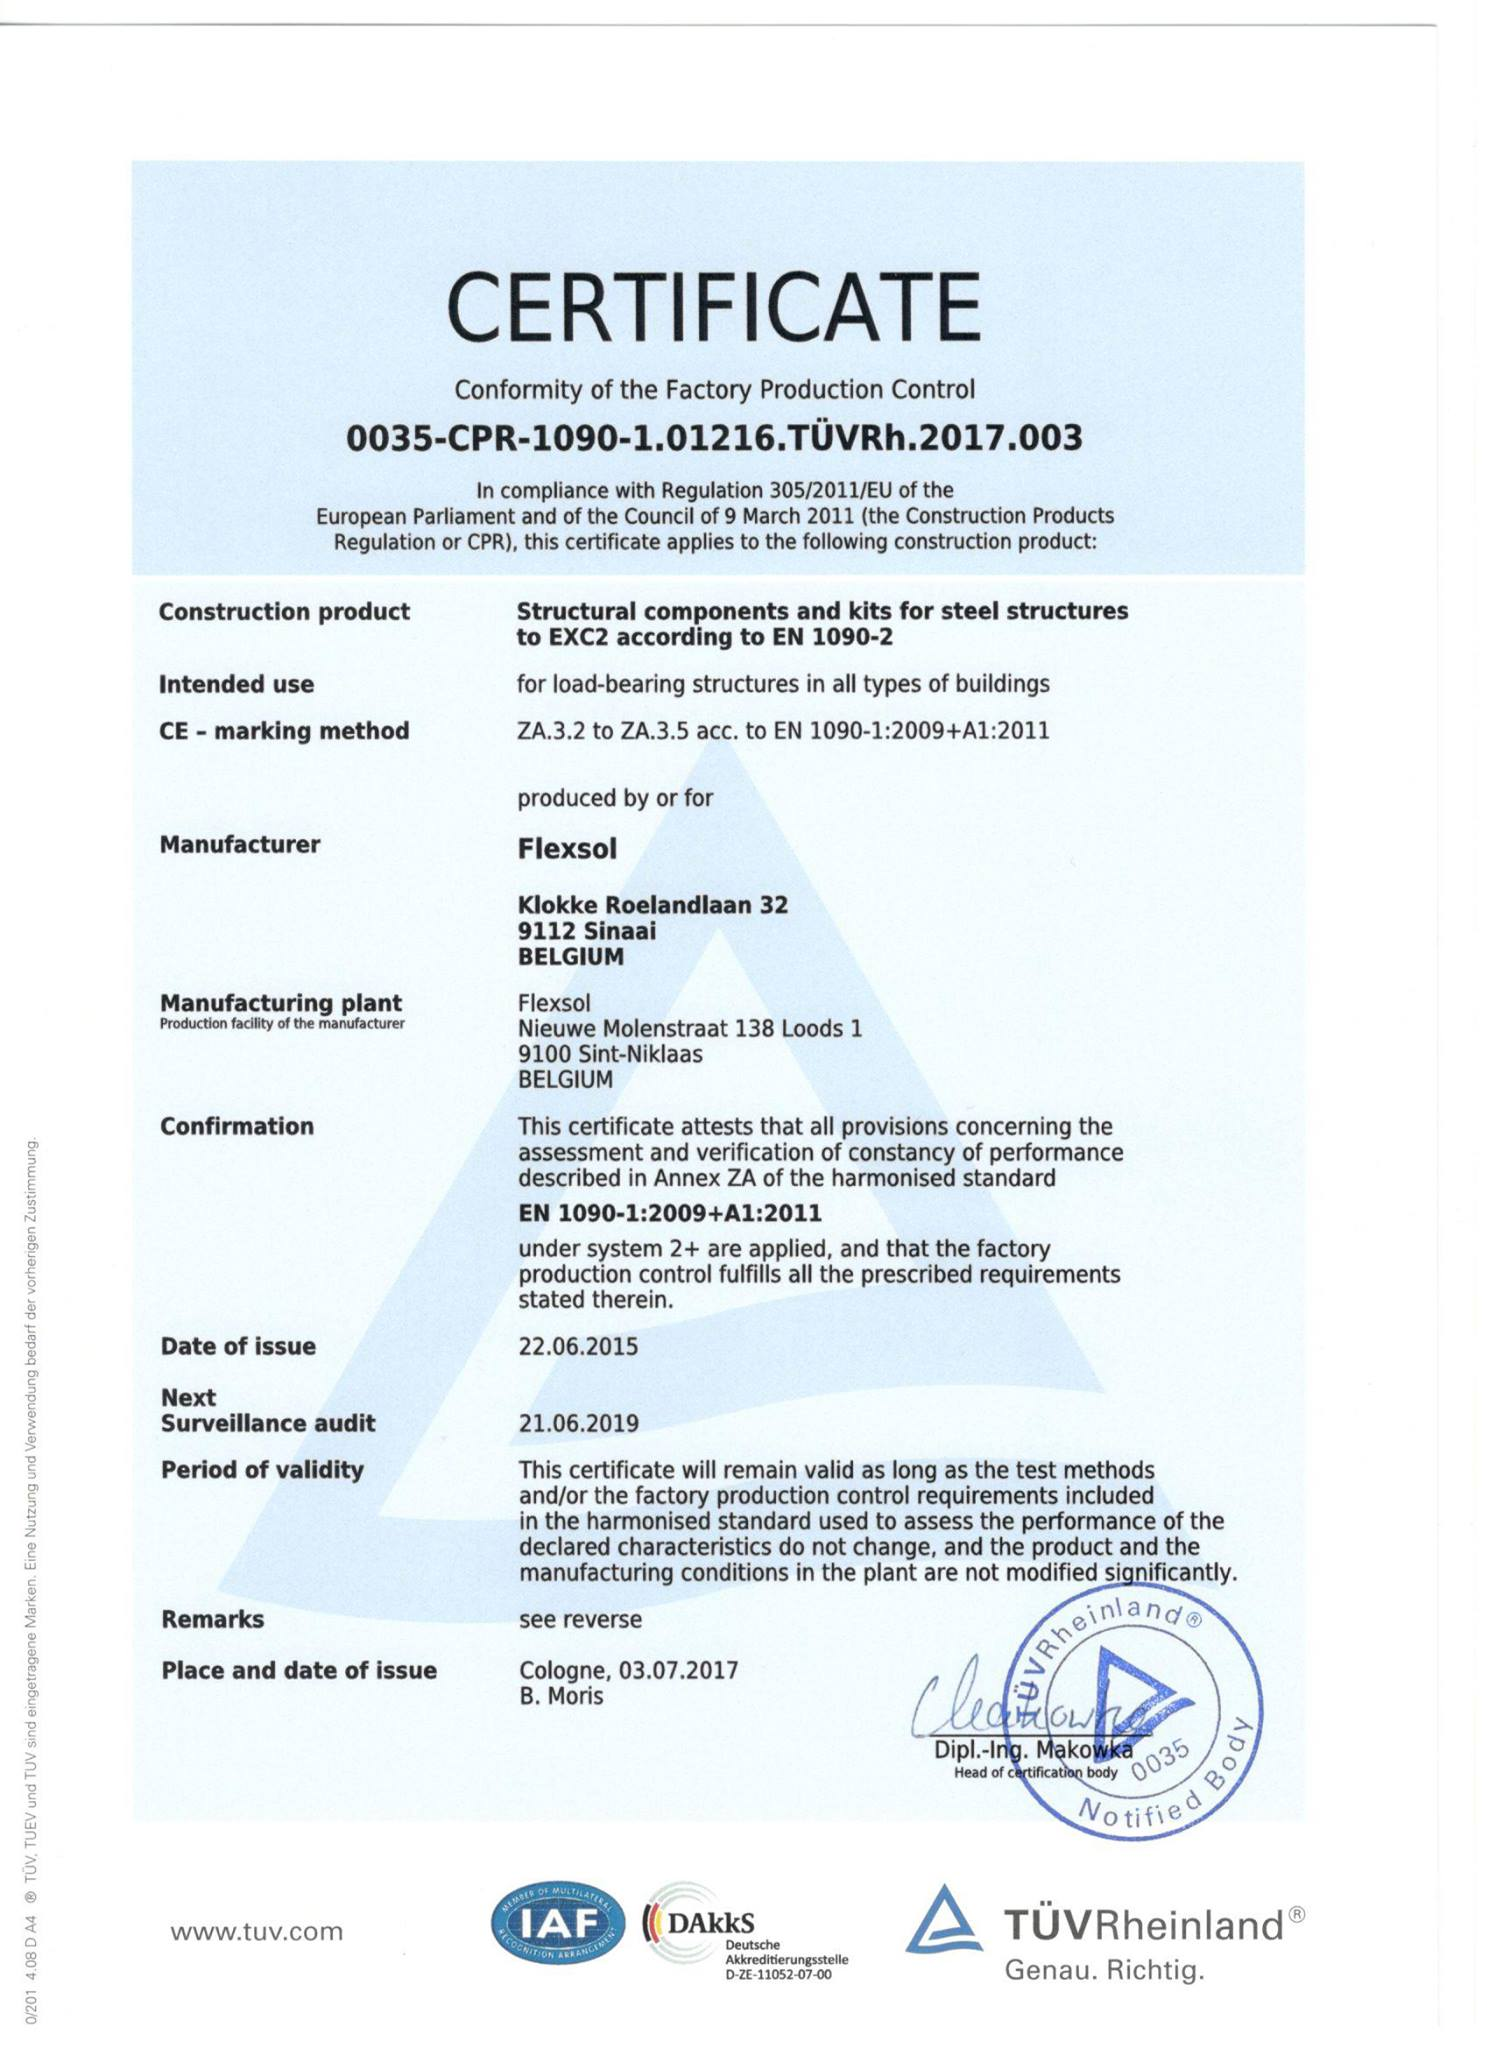 Flexsol - industrial welding & maintenance